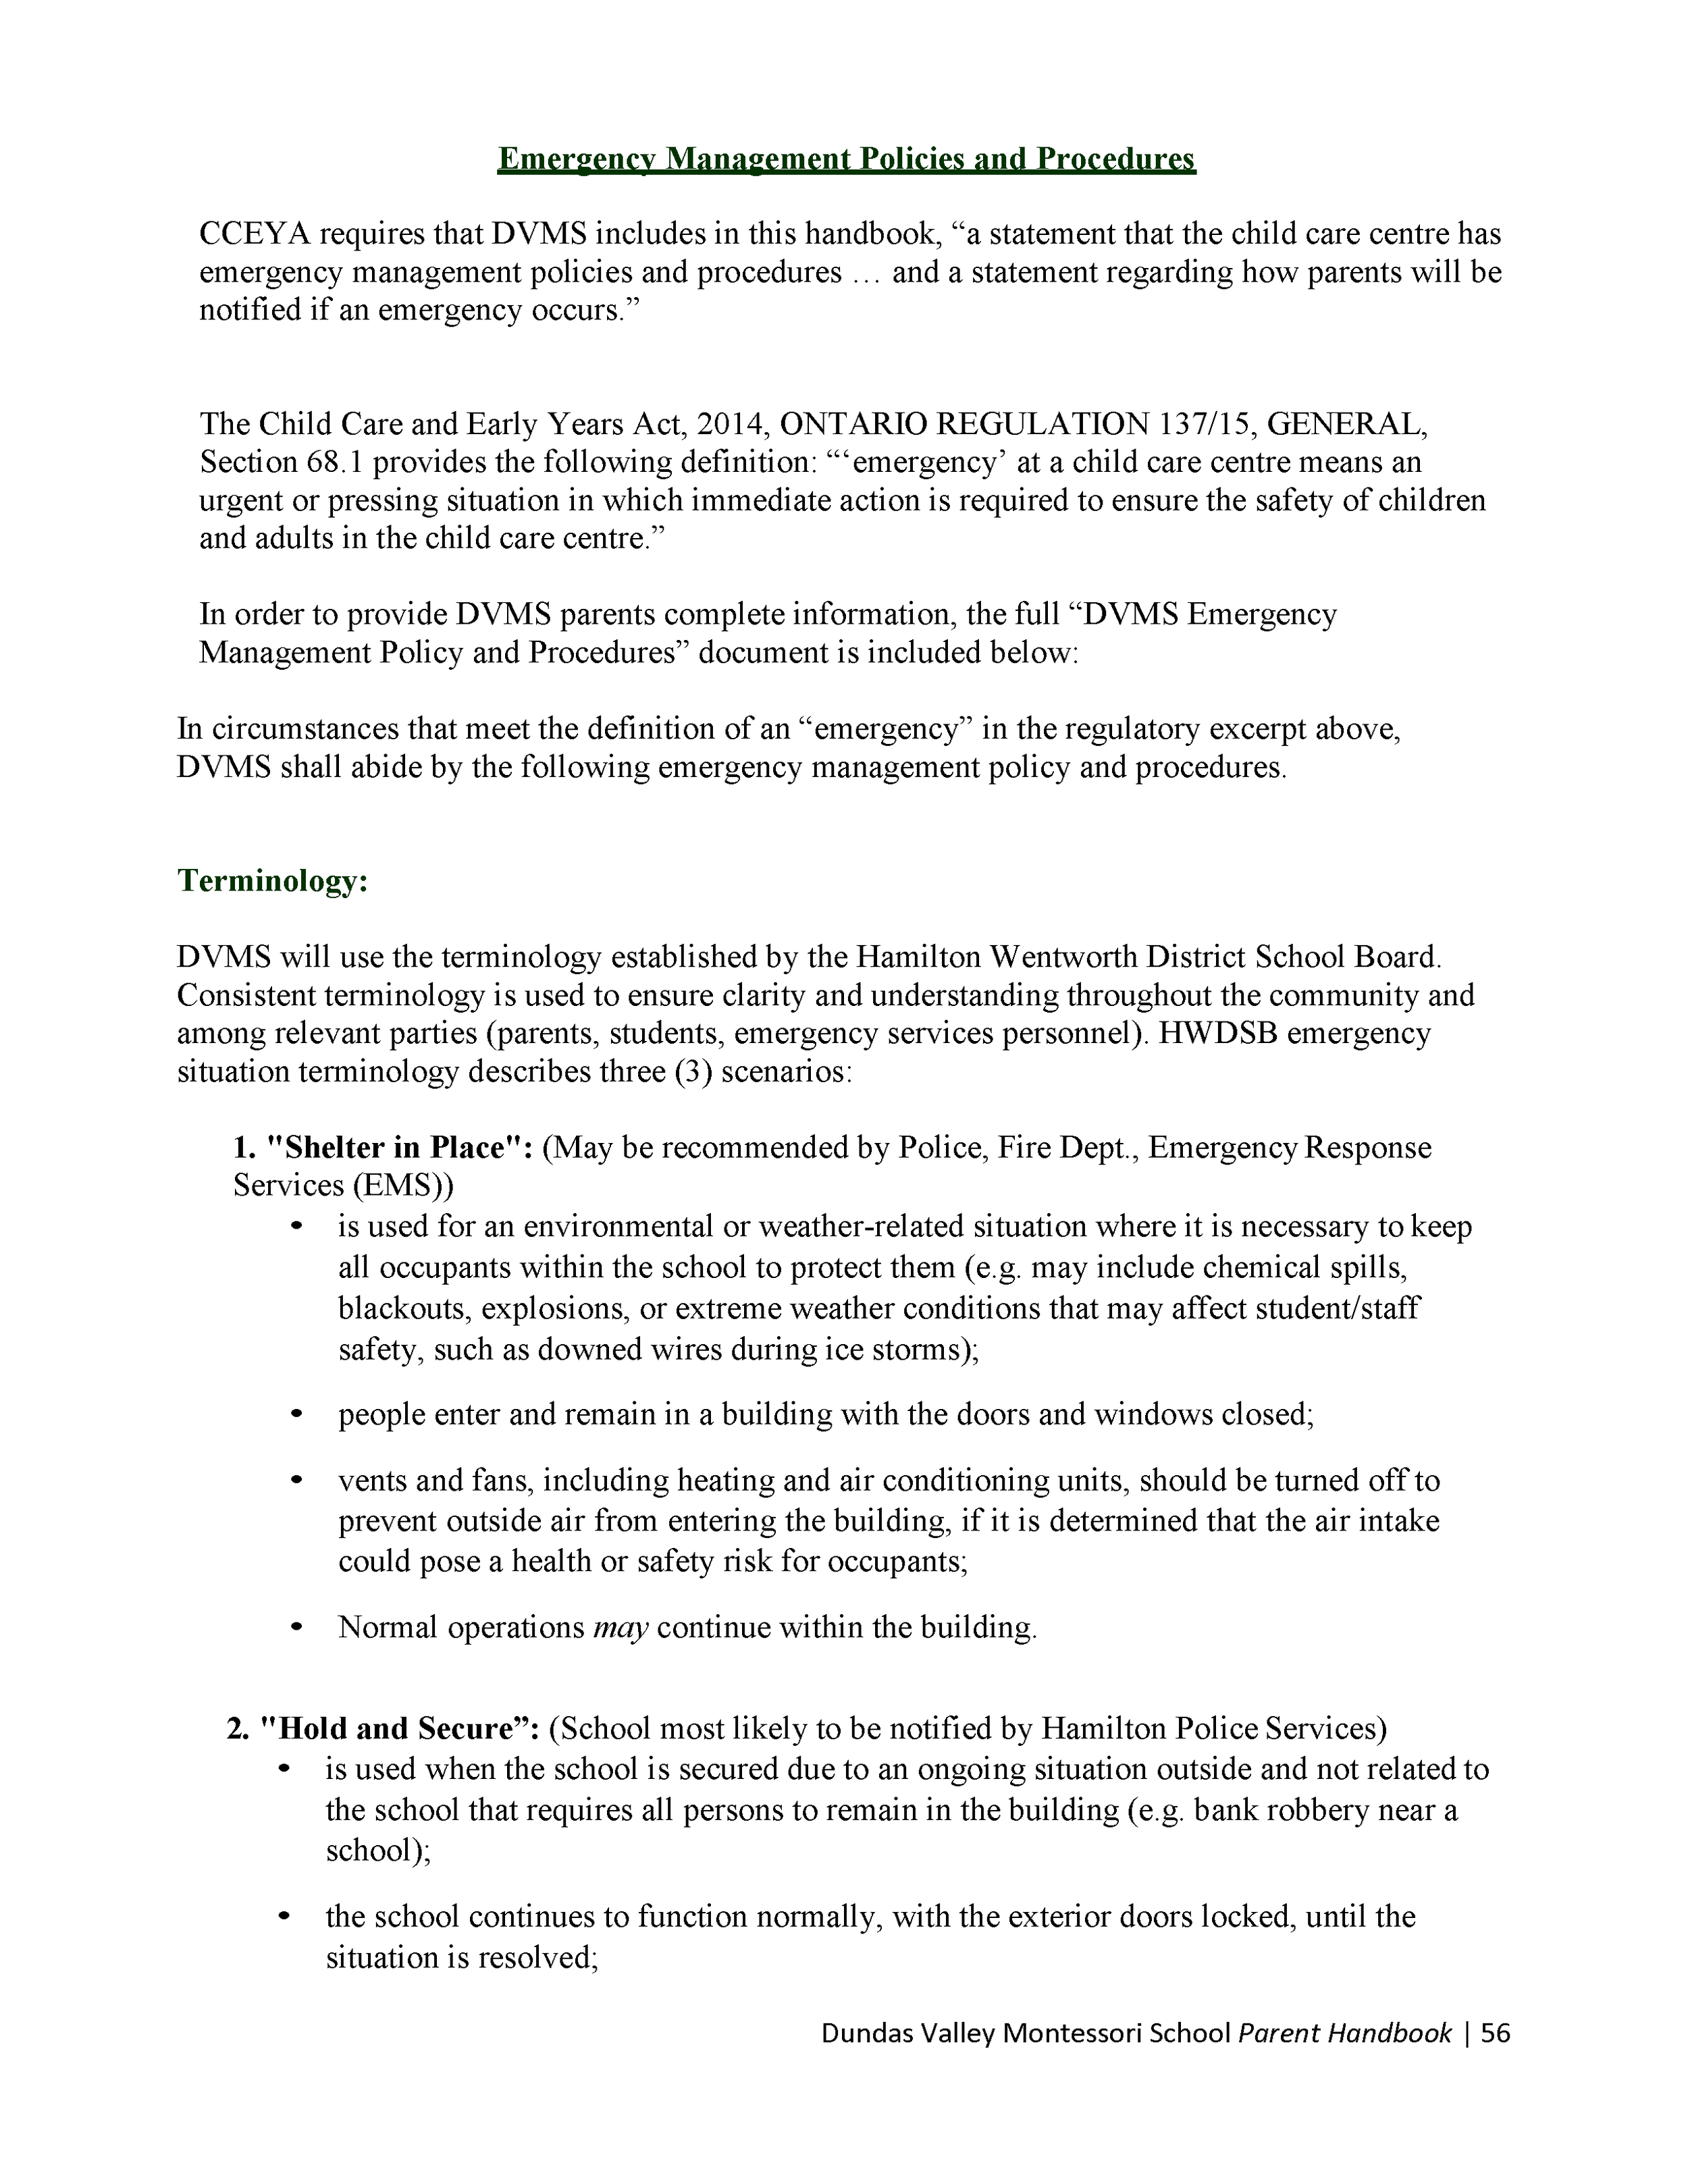 DVMS-Parent-Handbook-19-20_Page_058.png